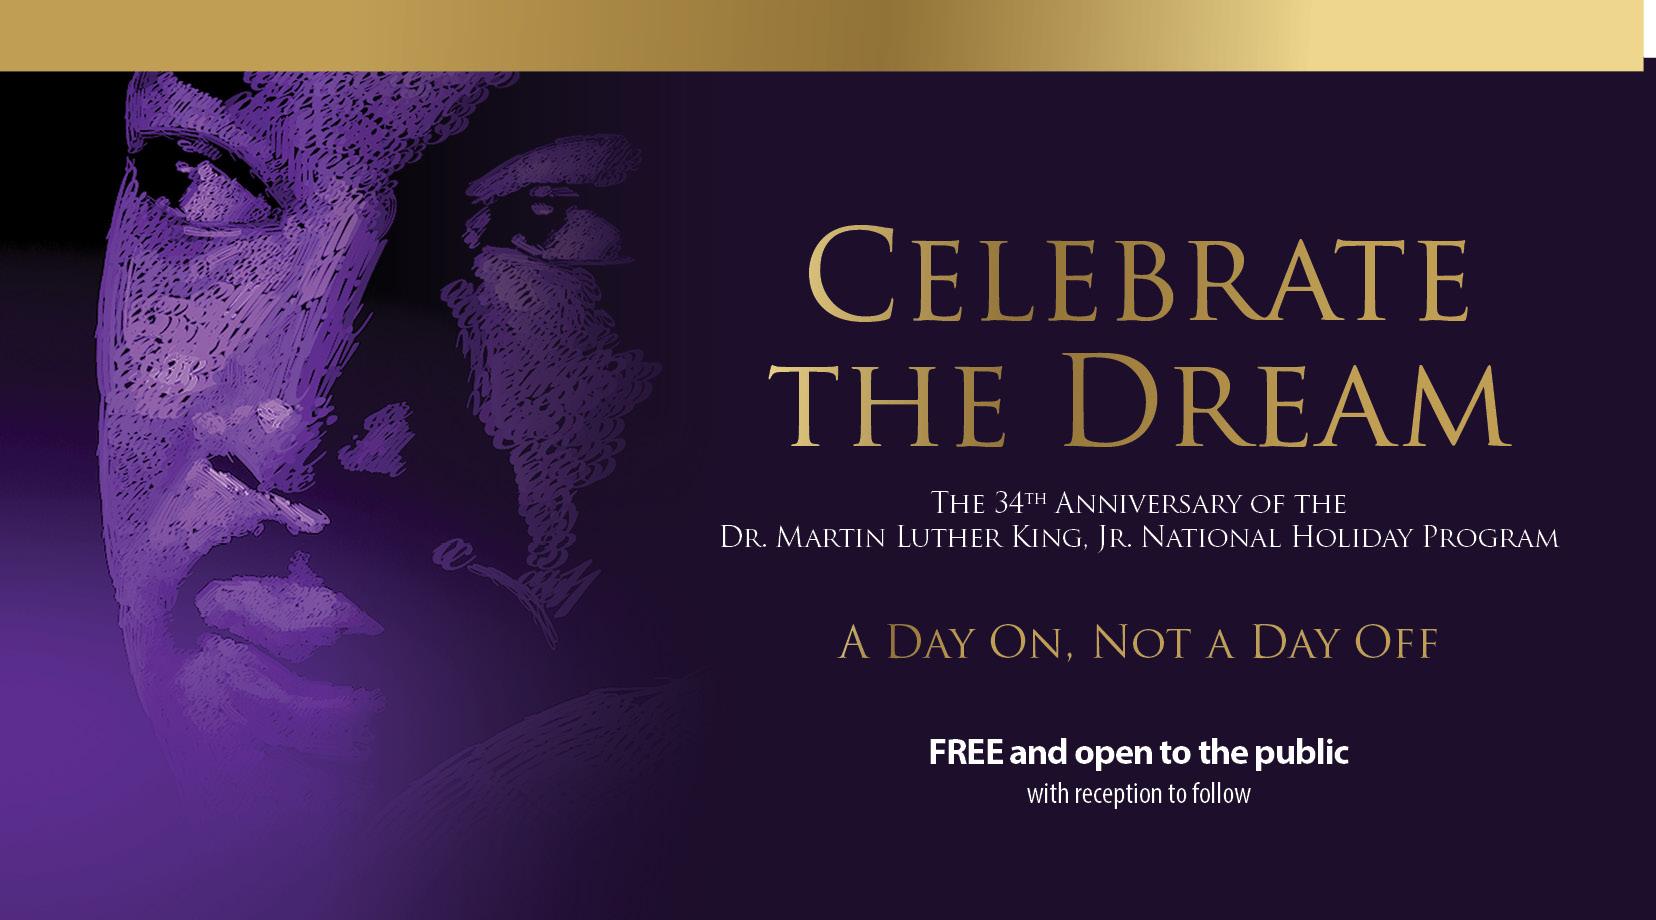 Celebrate The Dream